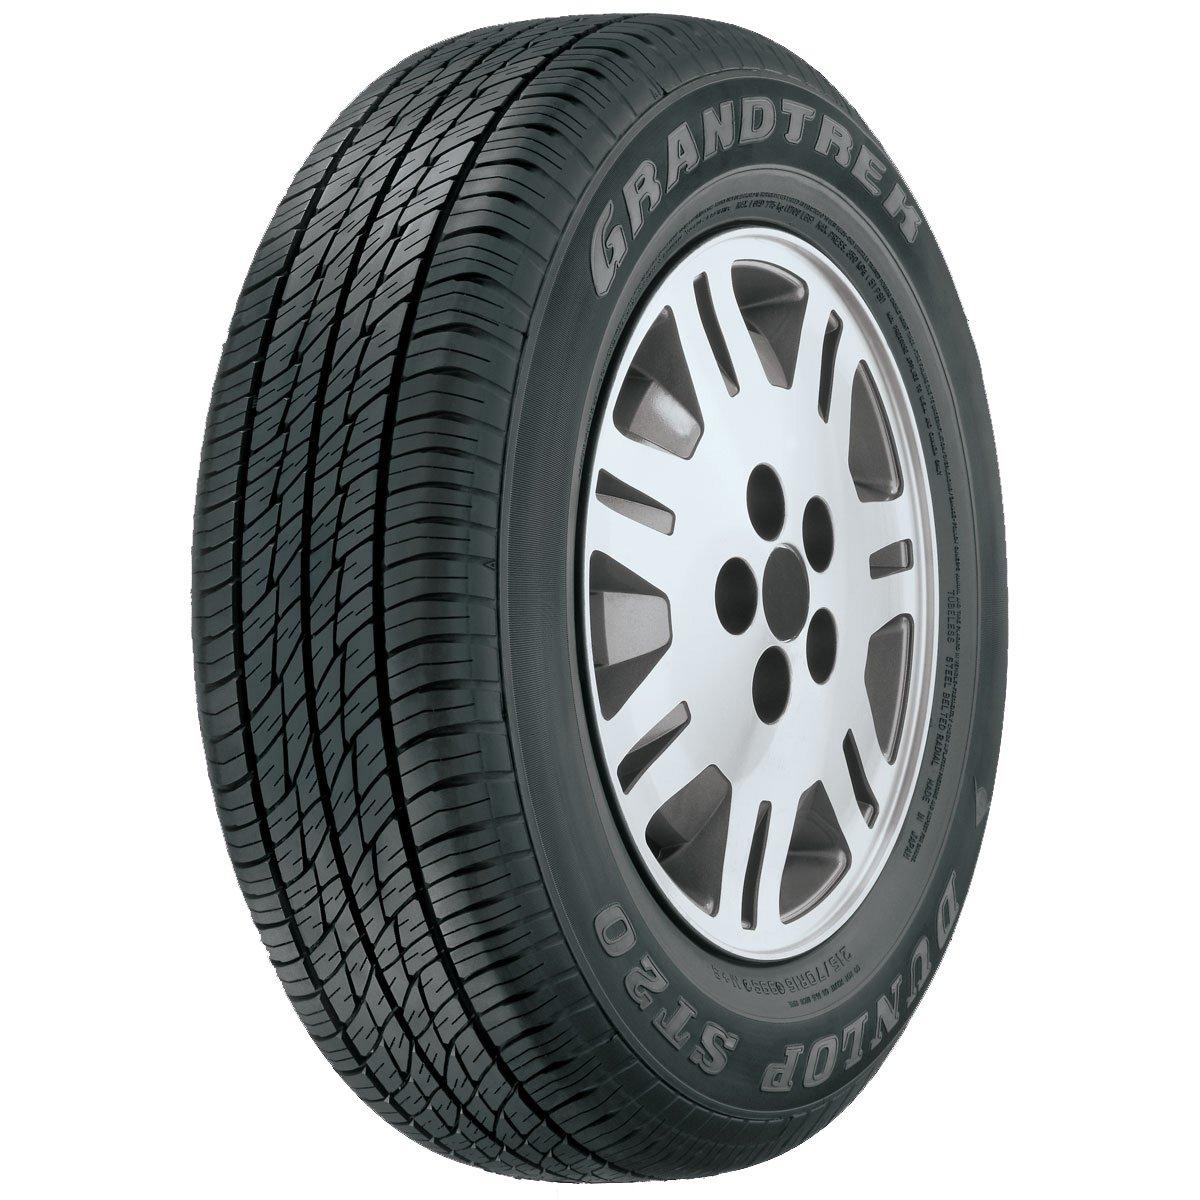 P225 65R17 Tires >> 17 Inch 225 65r17 Dunlop Grandtrek St30 Tire 225 65 17 102h P225 65r17 2256517